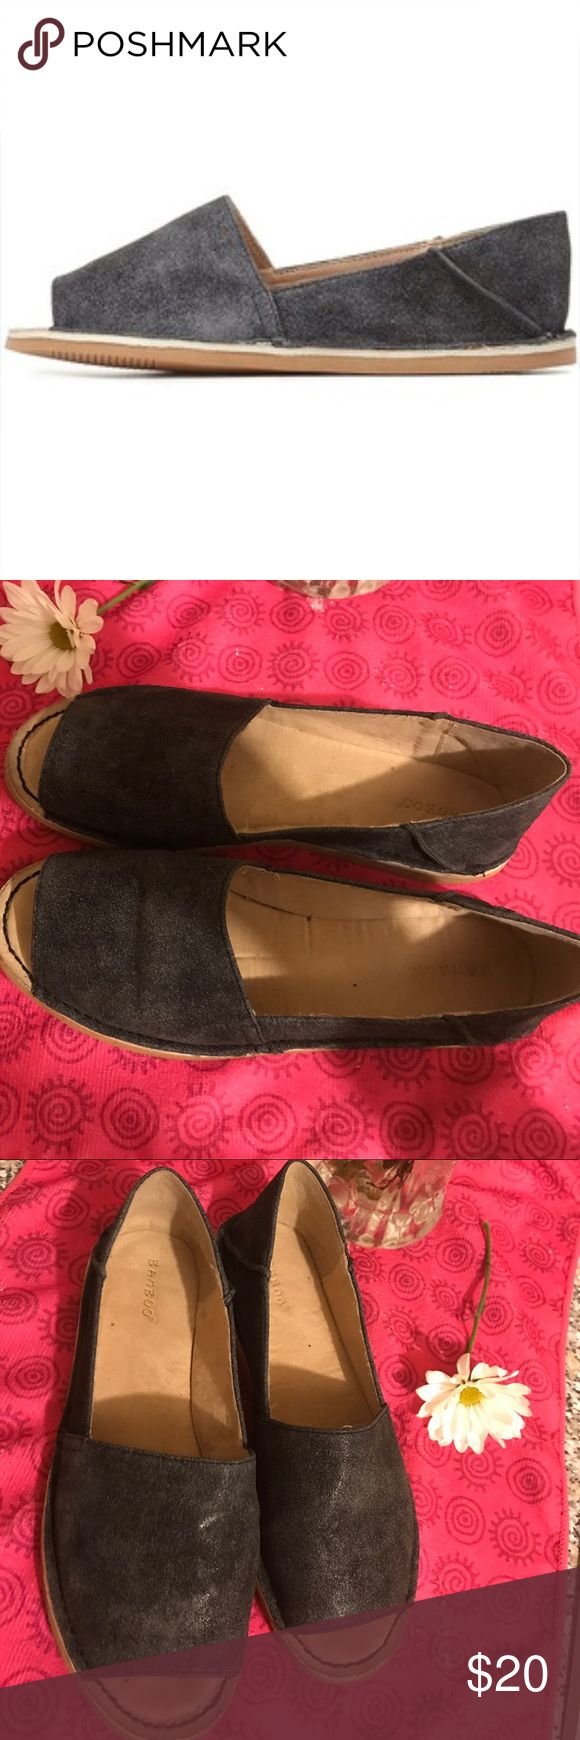 Bamboo peep toe Bamboo peep toe flats. Size 9 super comfy Shoes Flats & Loafers